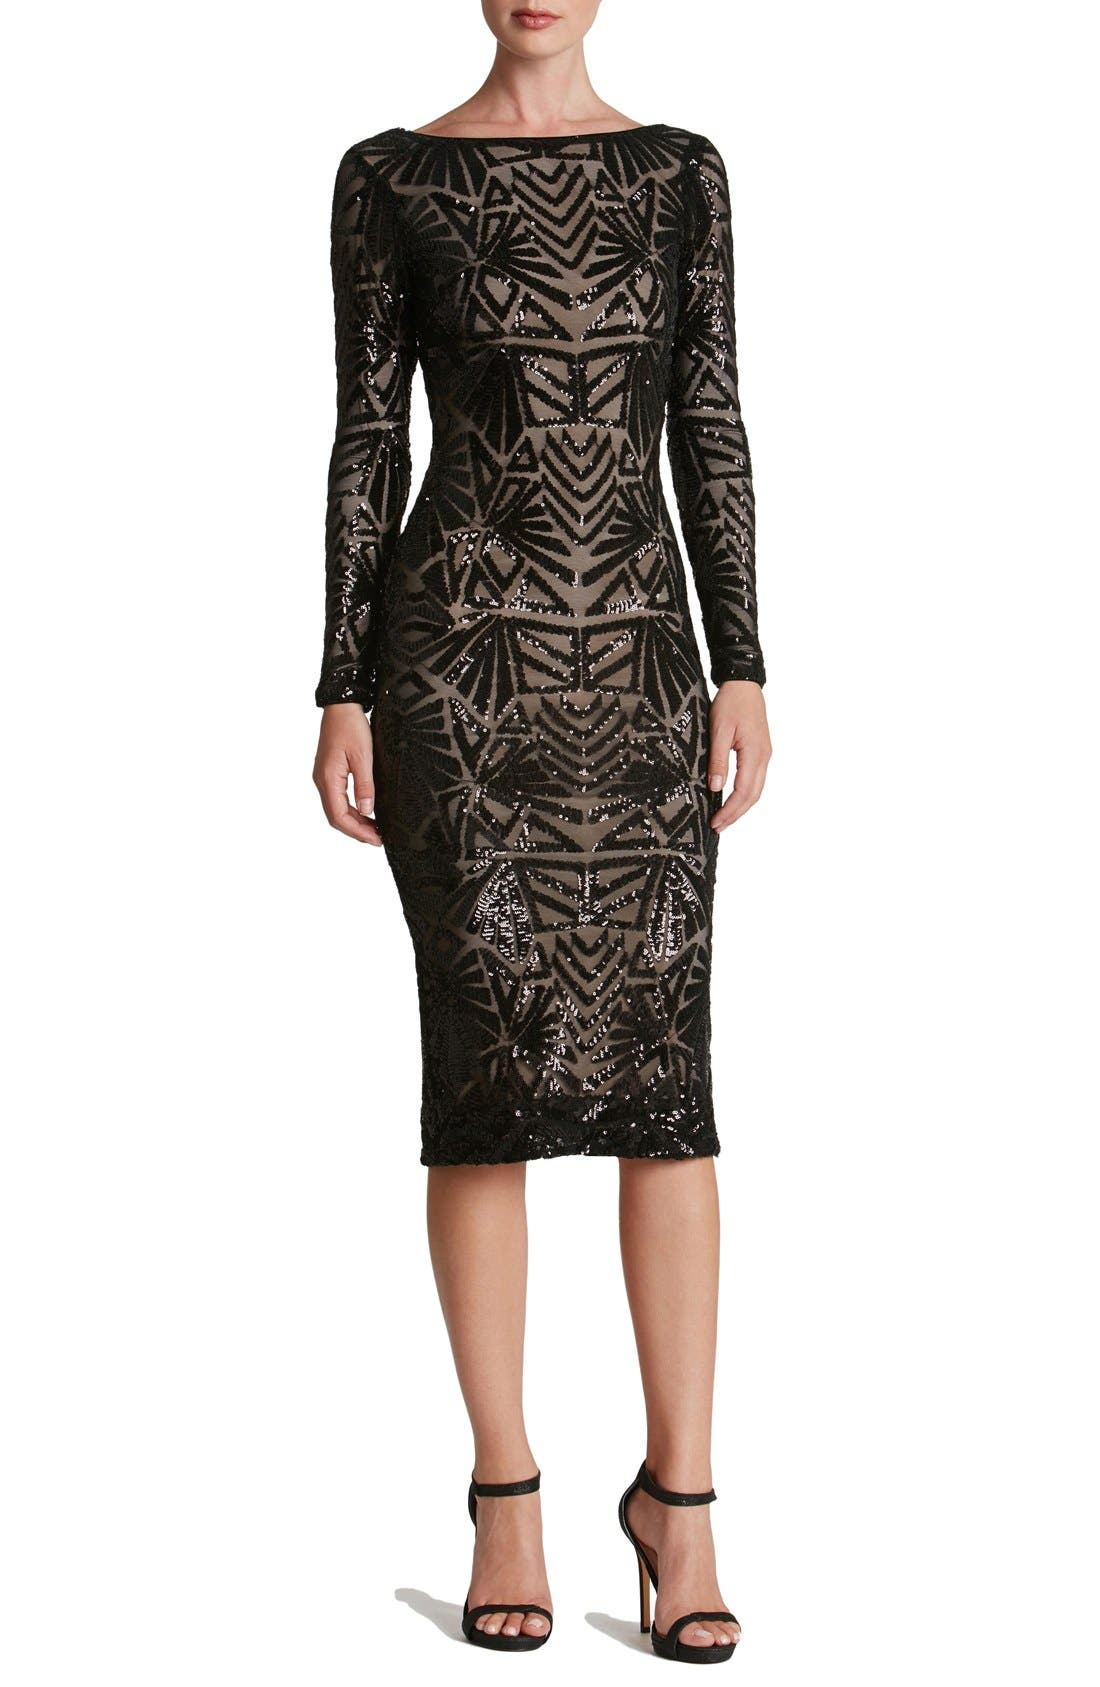 DRESS THE POPULATION, Emery Midi Dress, Main thumbnail 1, color, 001